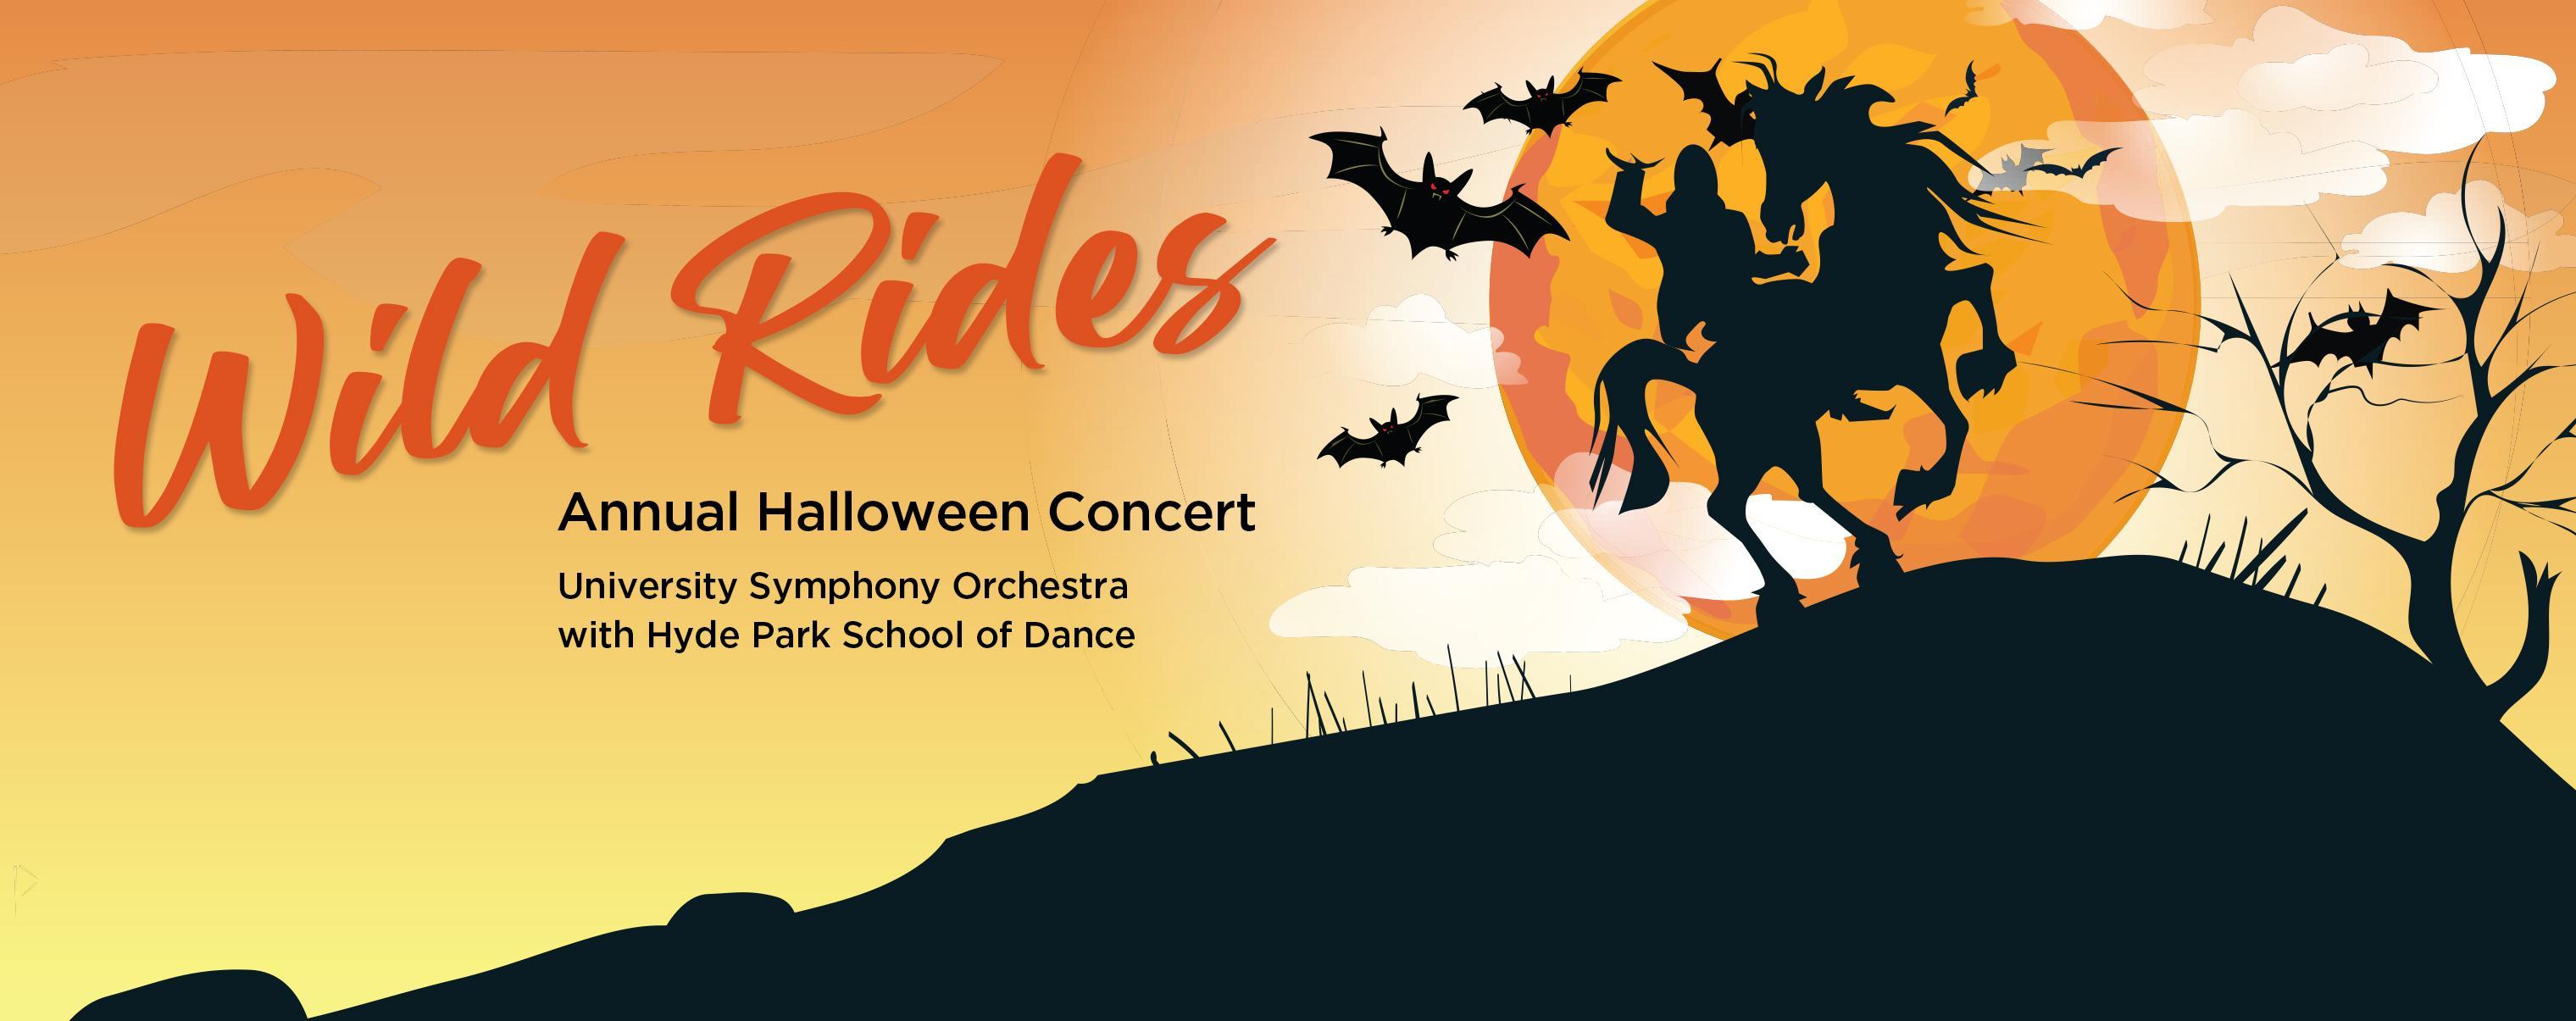 Wild Rides: University Symphony Orchestra Halloween Concert